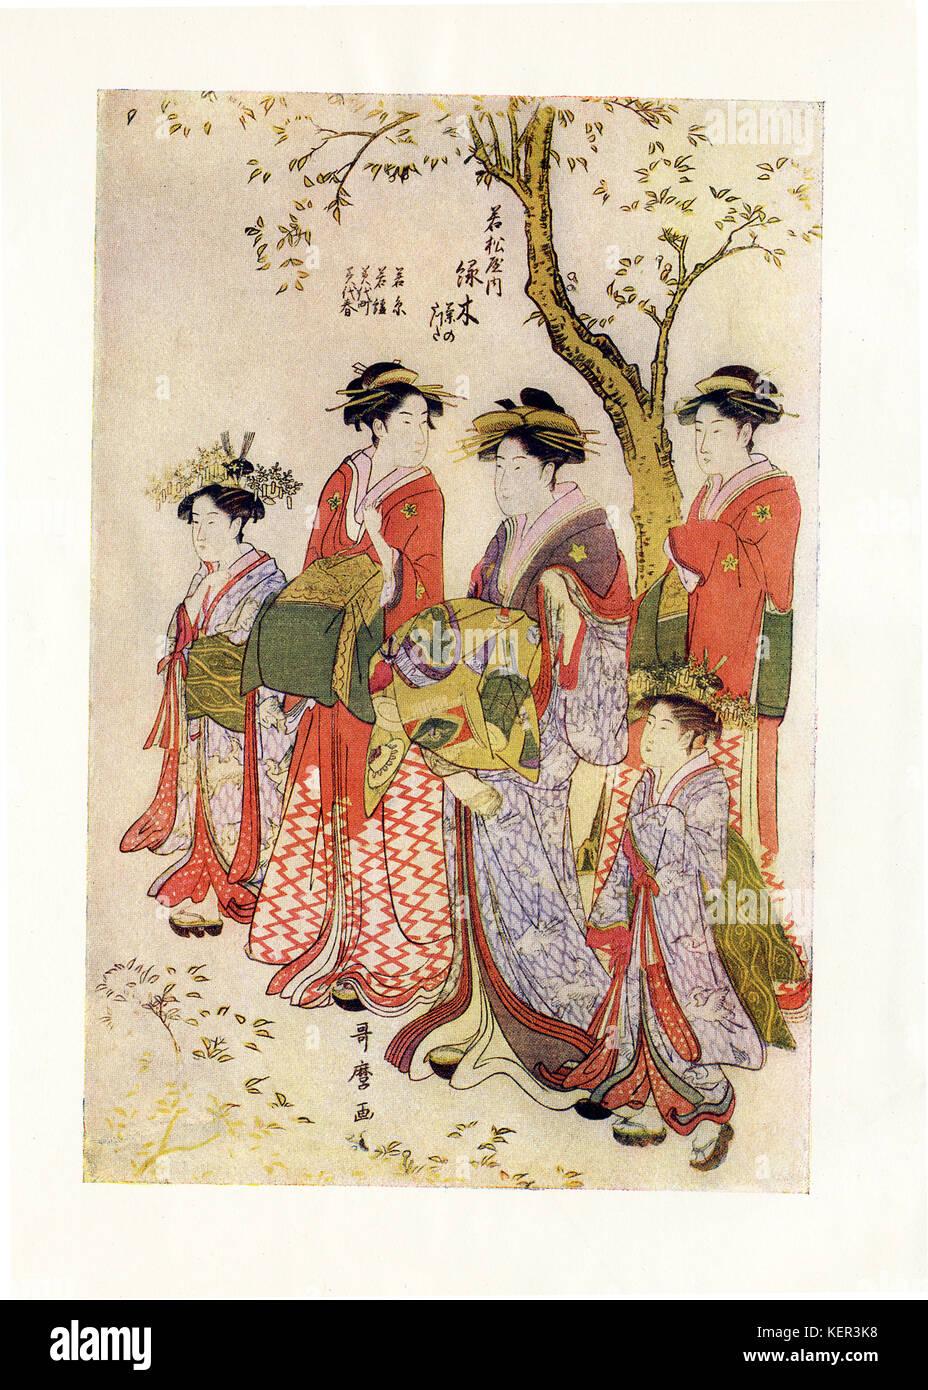 The caption for this illustration reads: Utamaro: Midorigi of Wakamatsu-ya on parade. Kitagawa Utamaro was a Japanese - Stock Image